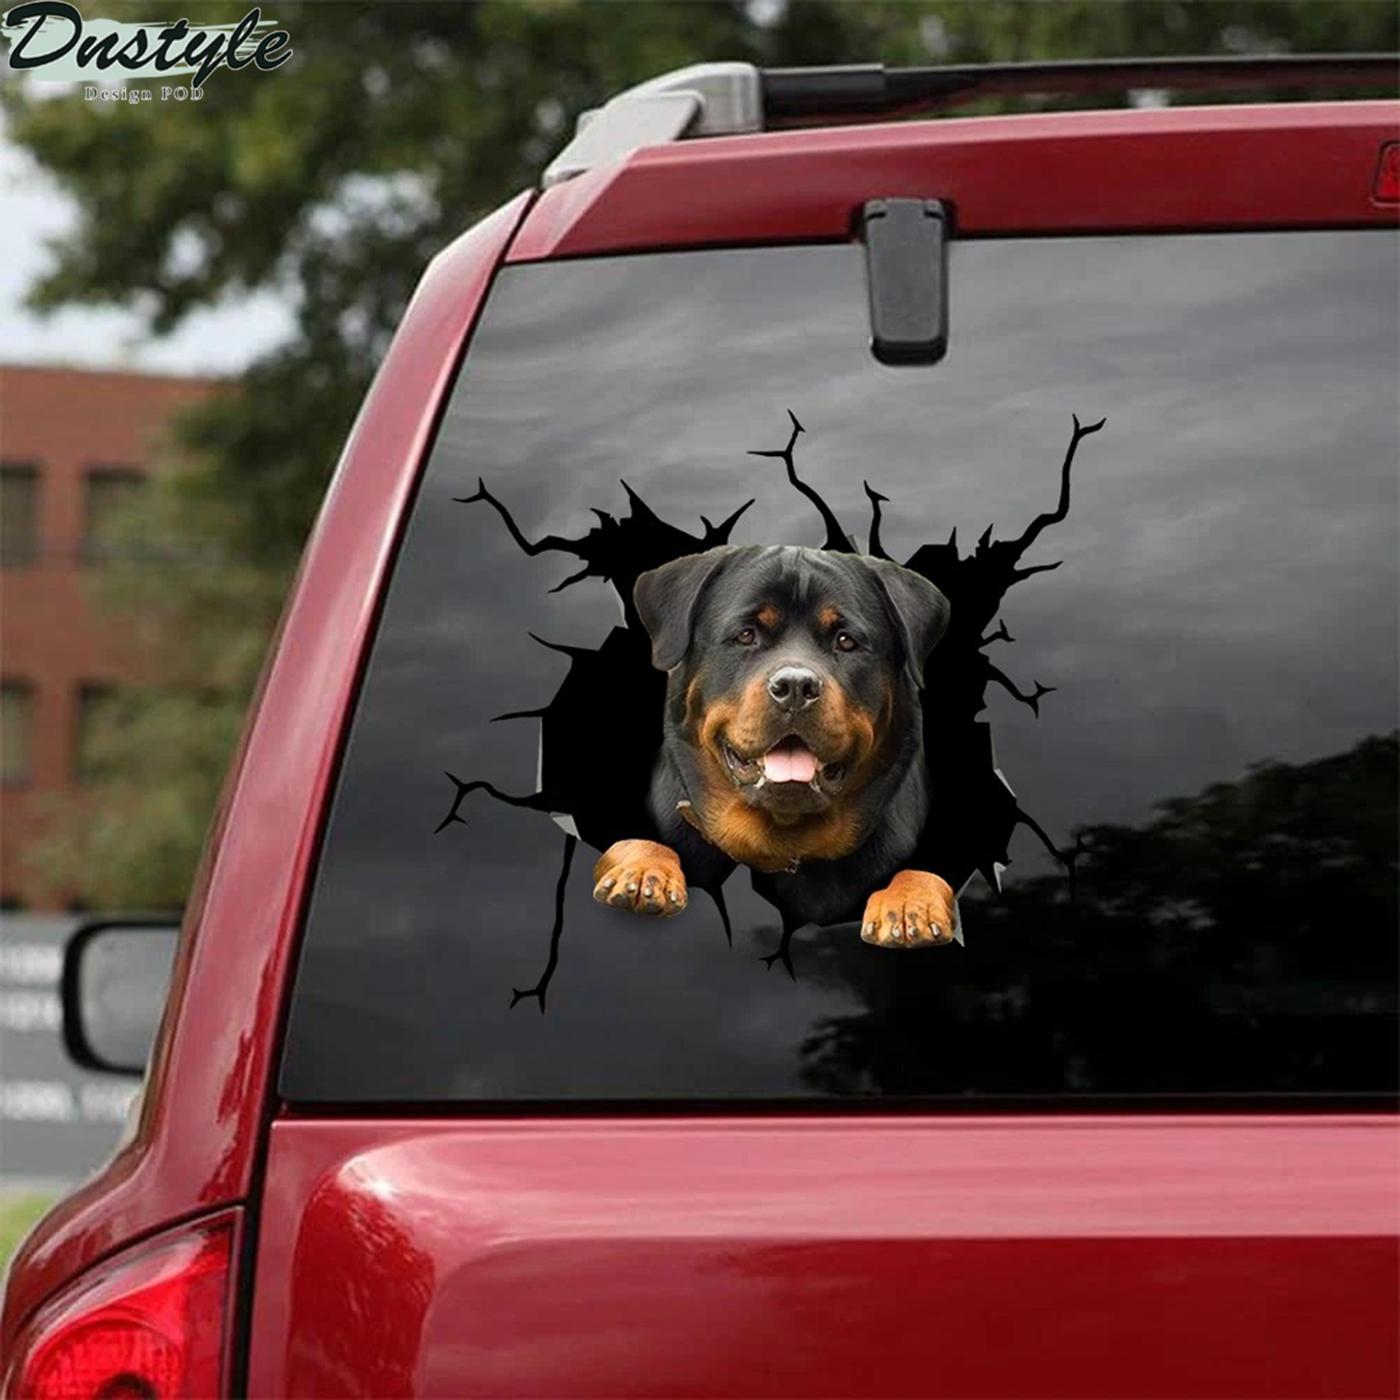 Funny rottweiler crack car decal sticker 2